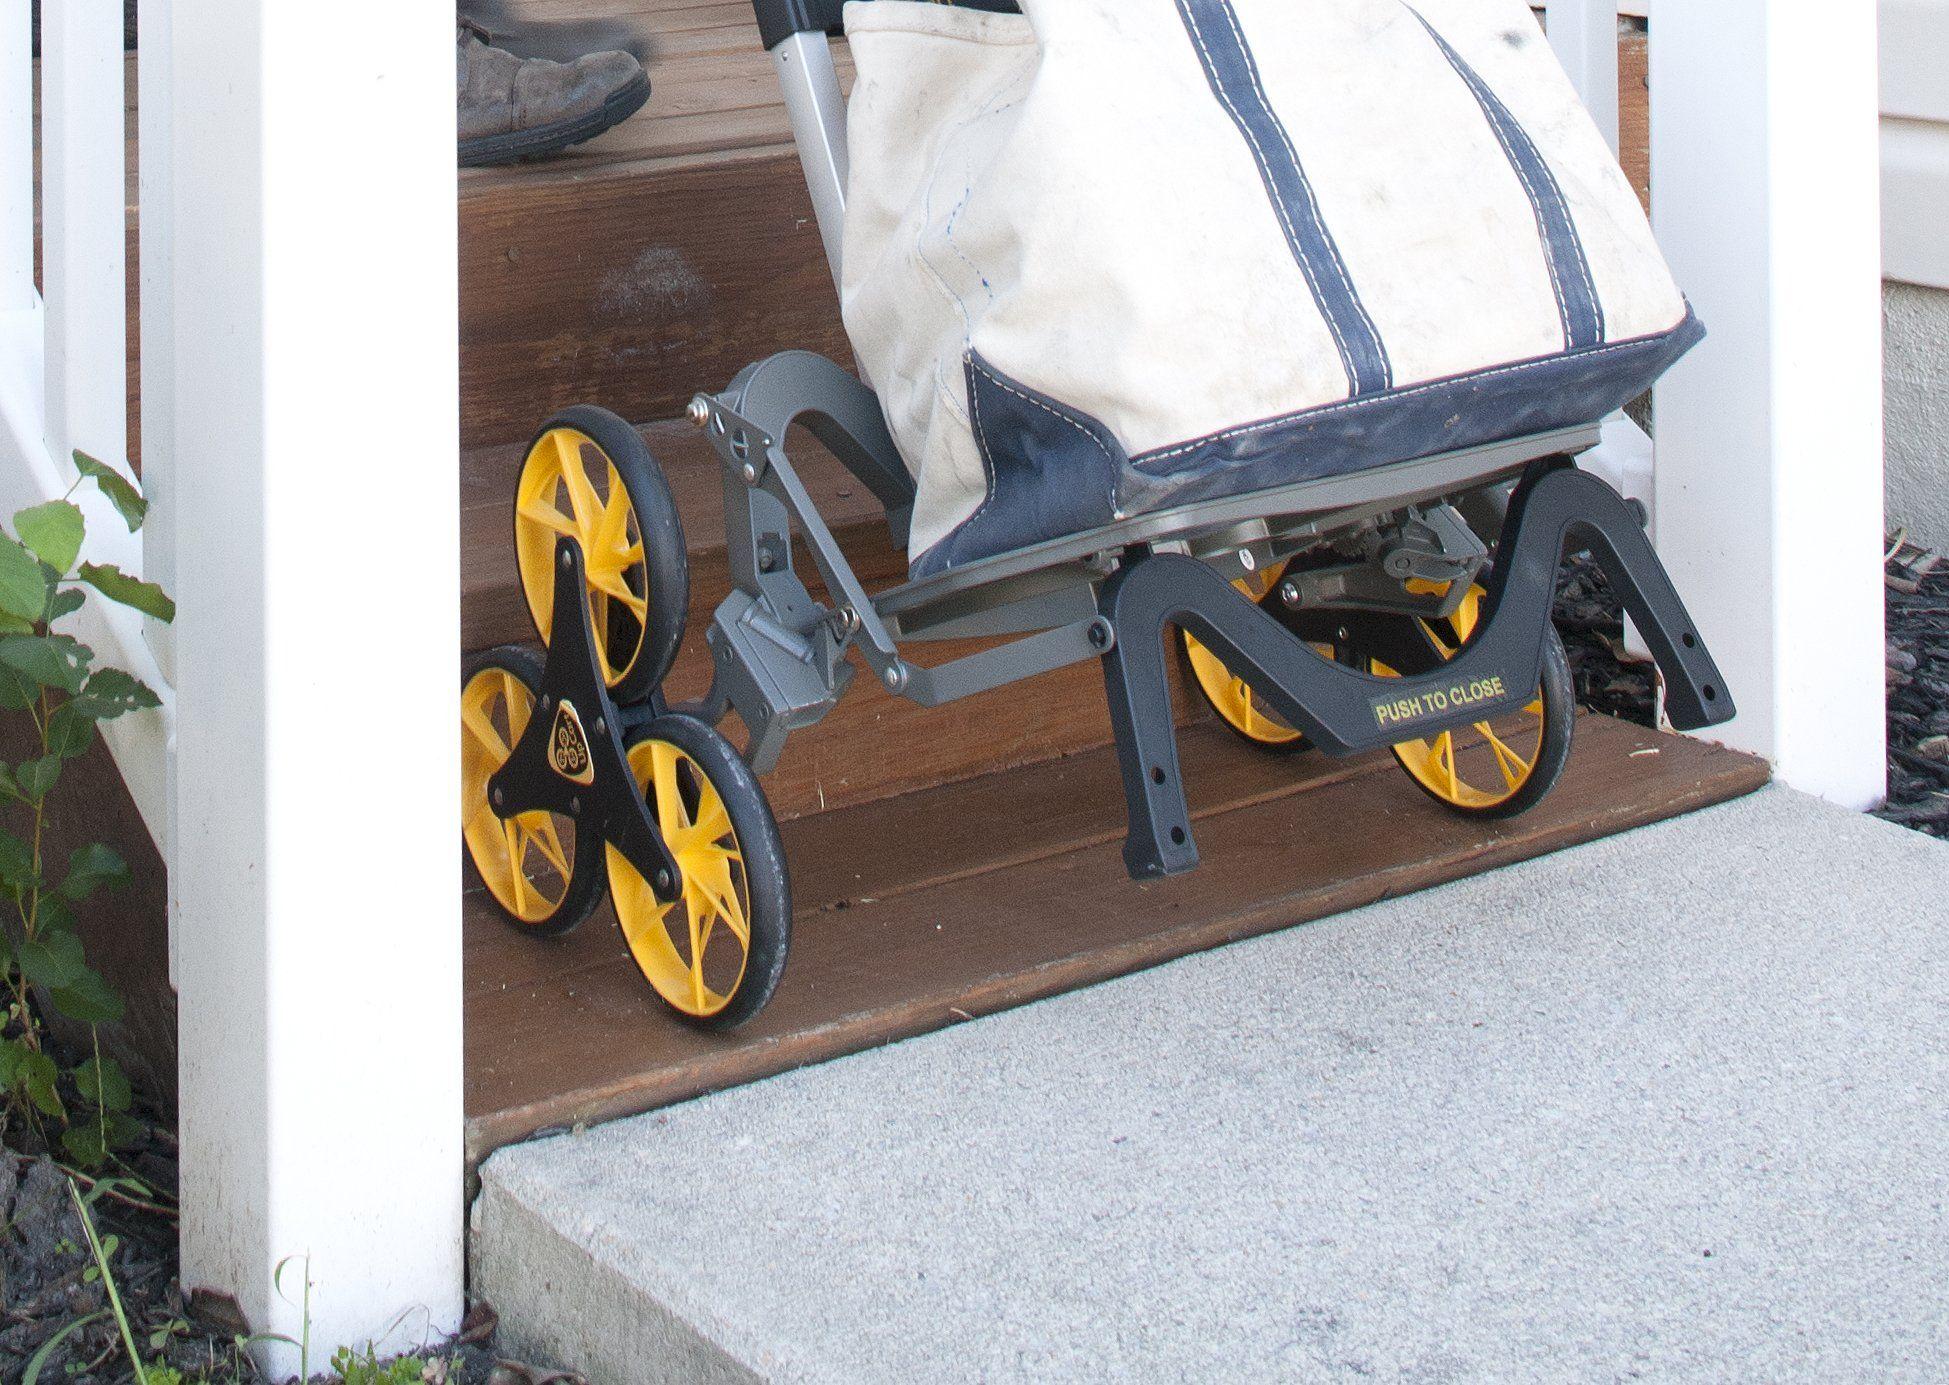 215d682f889b Amazon.com - Upcart - The All-terrain Stair Climbing Folding Cart ...